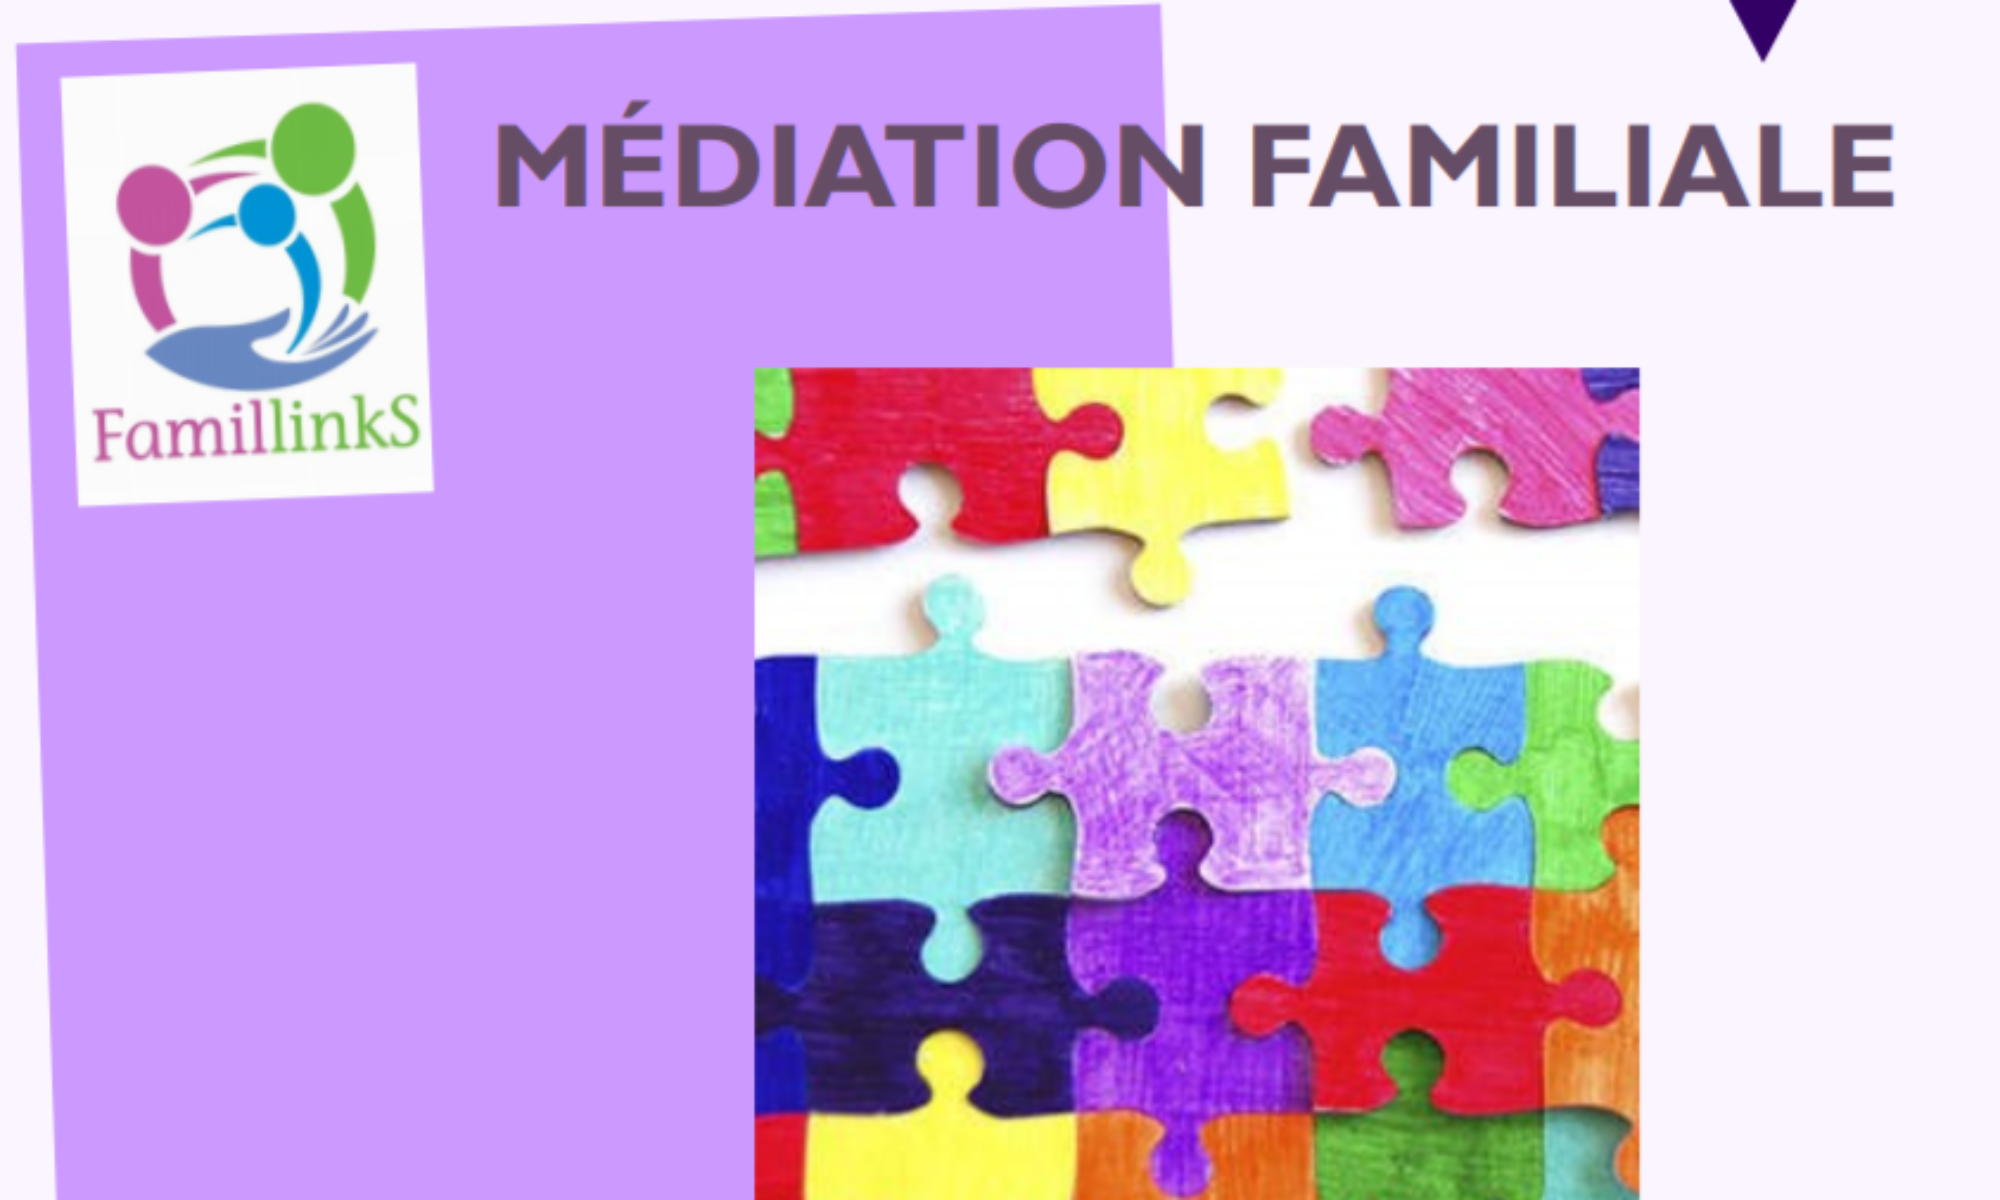 Famillinks - Cabinet de mediation